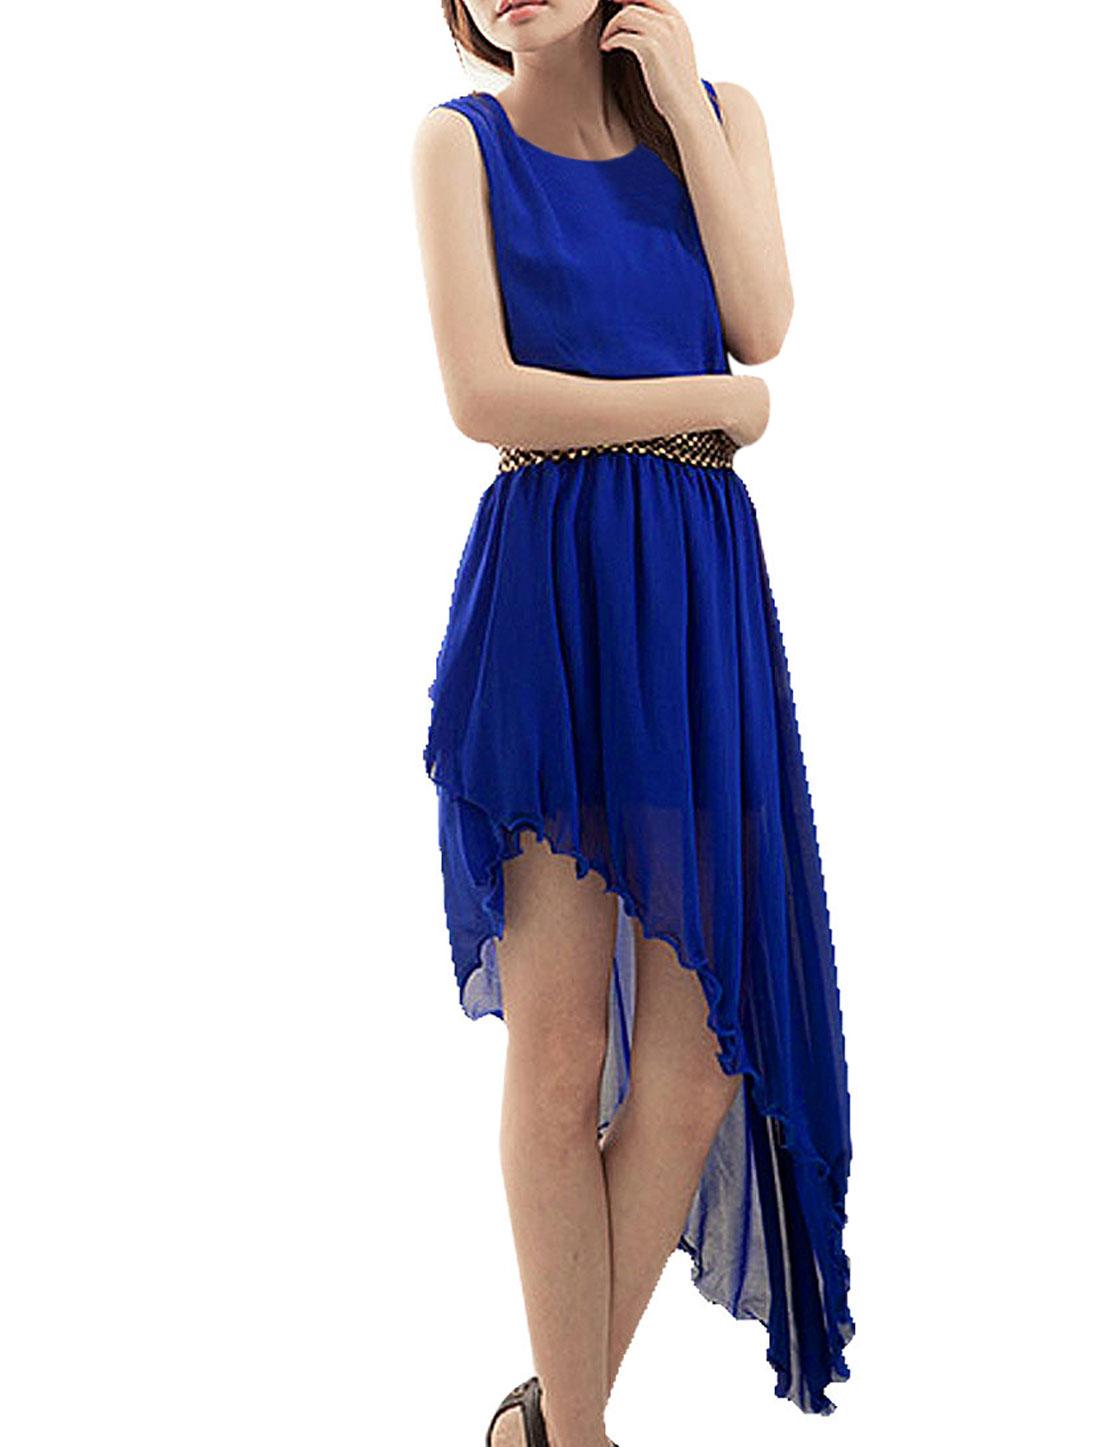 Lady Blue Low High Hem Wavy Design Elastic Waist Sleeveless Dress XS